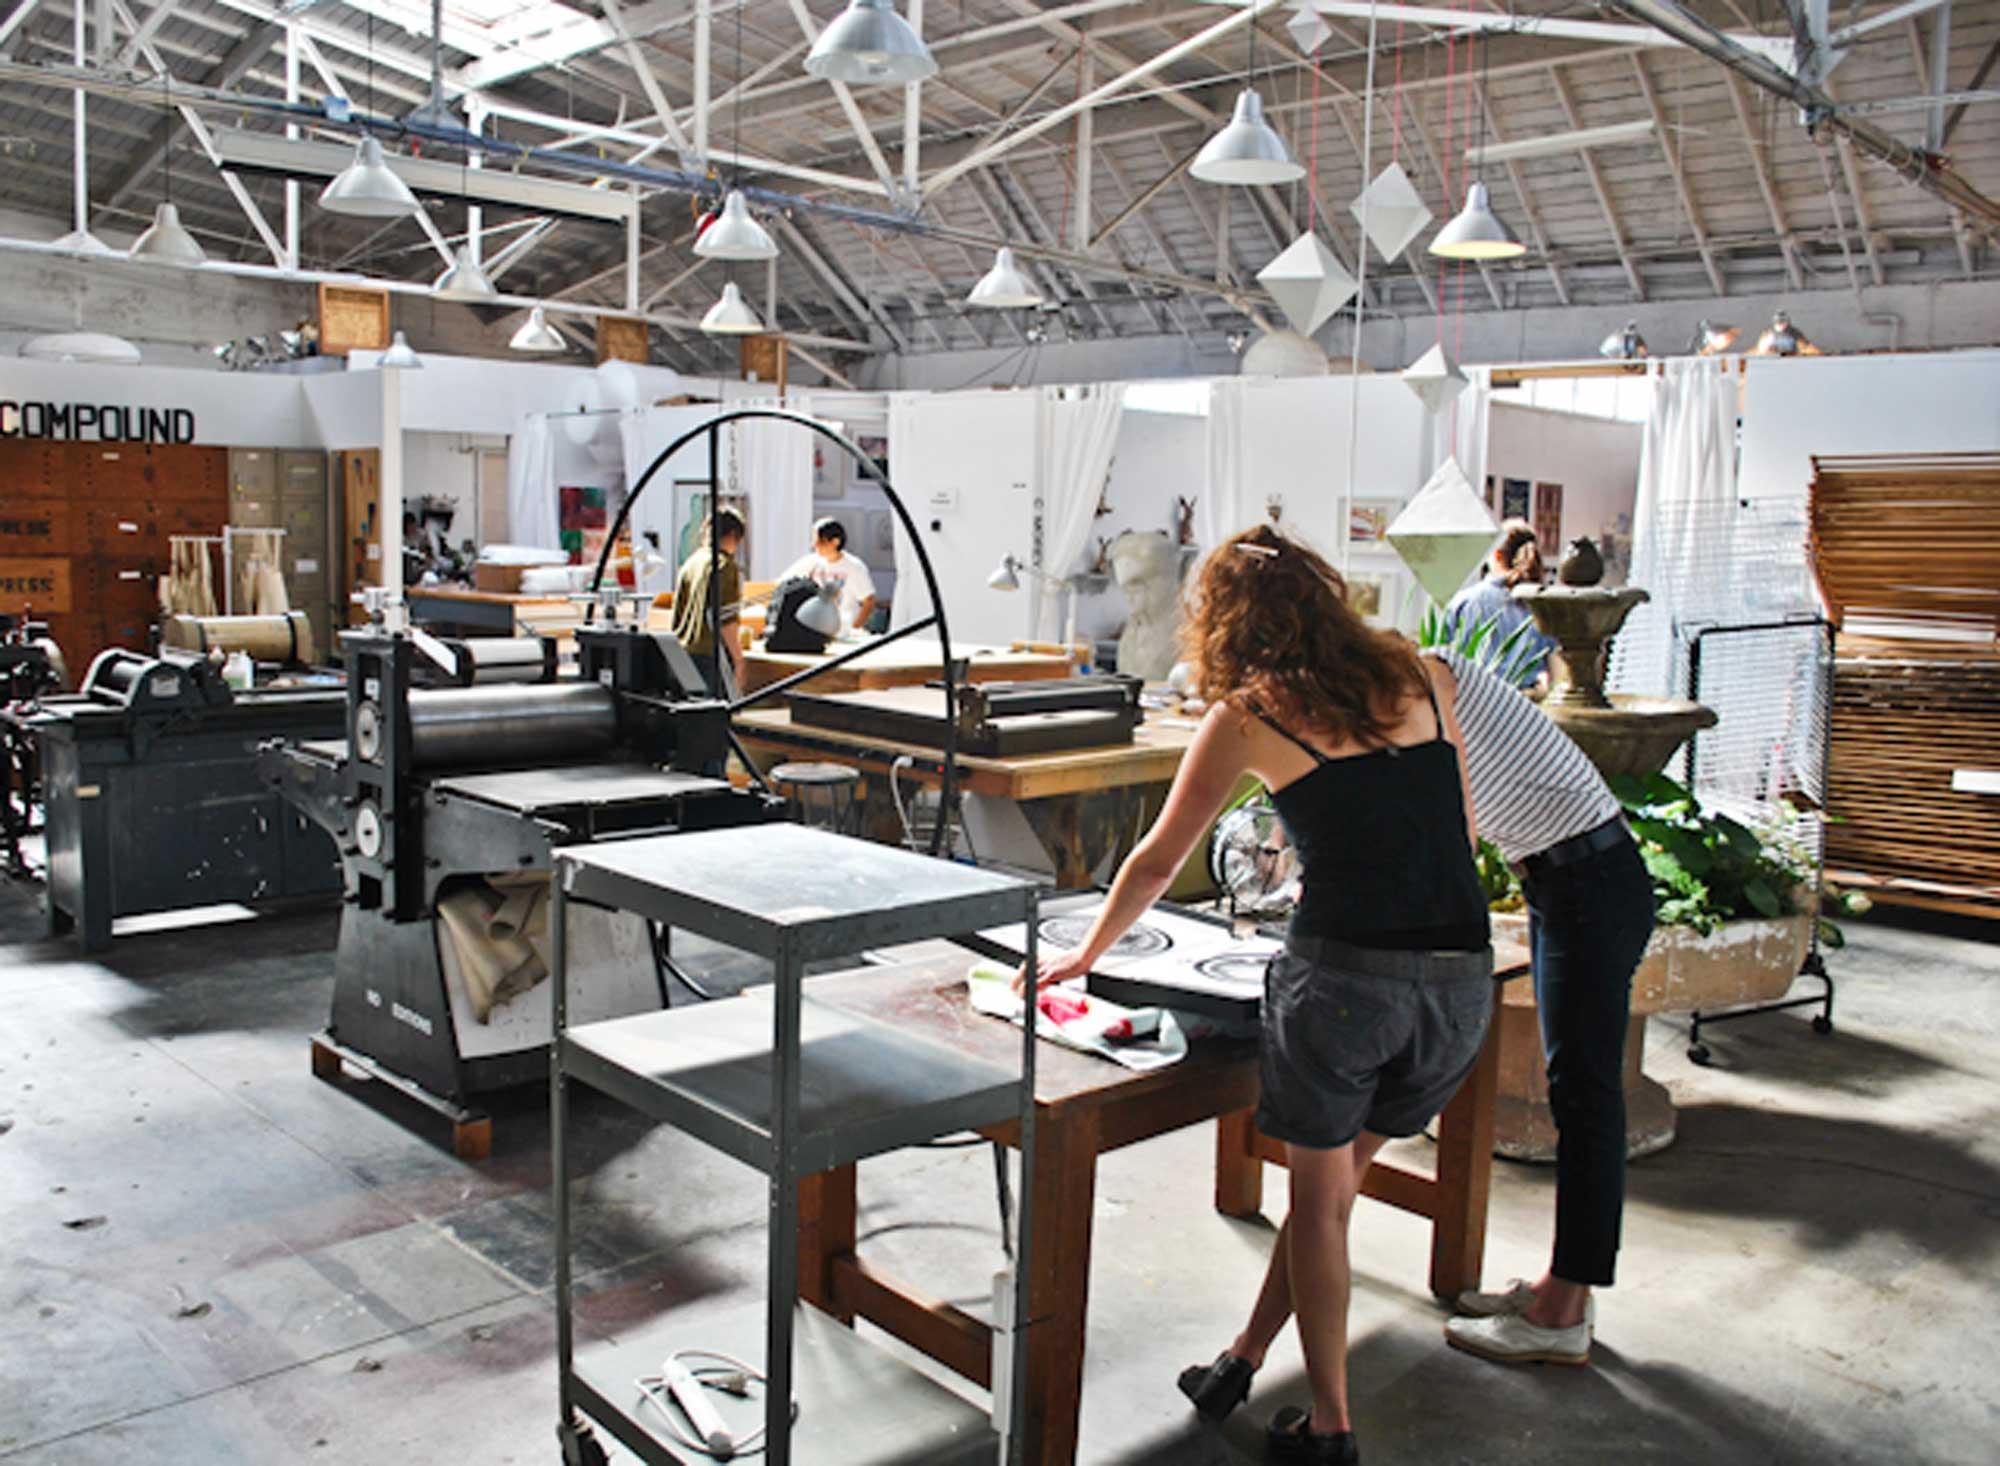 The Compound Gallery Interdisciplinary Art Residency Program